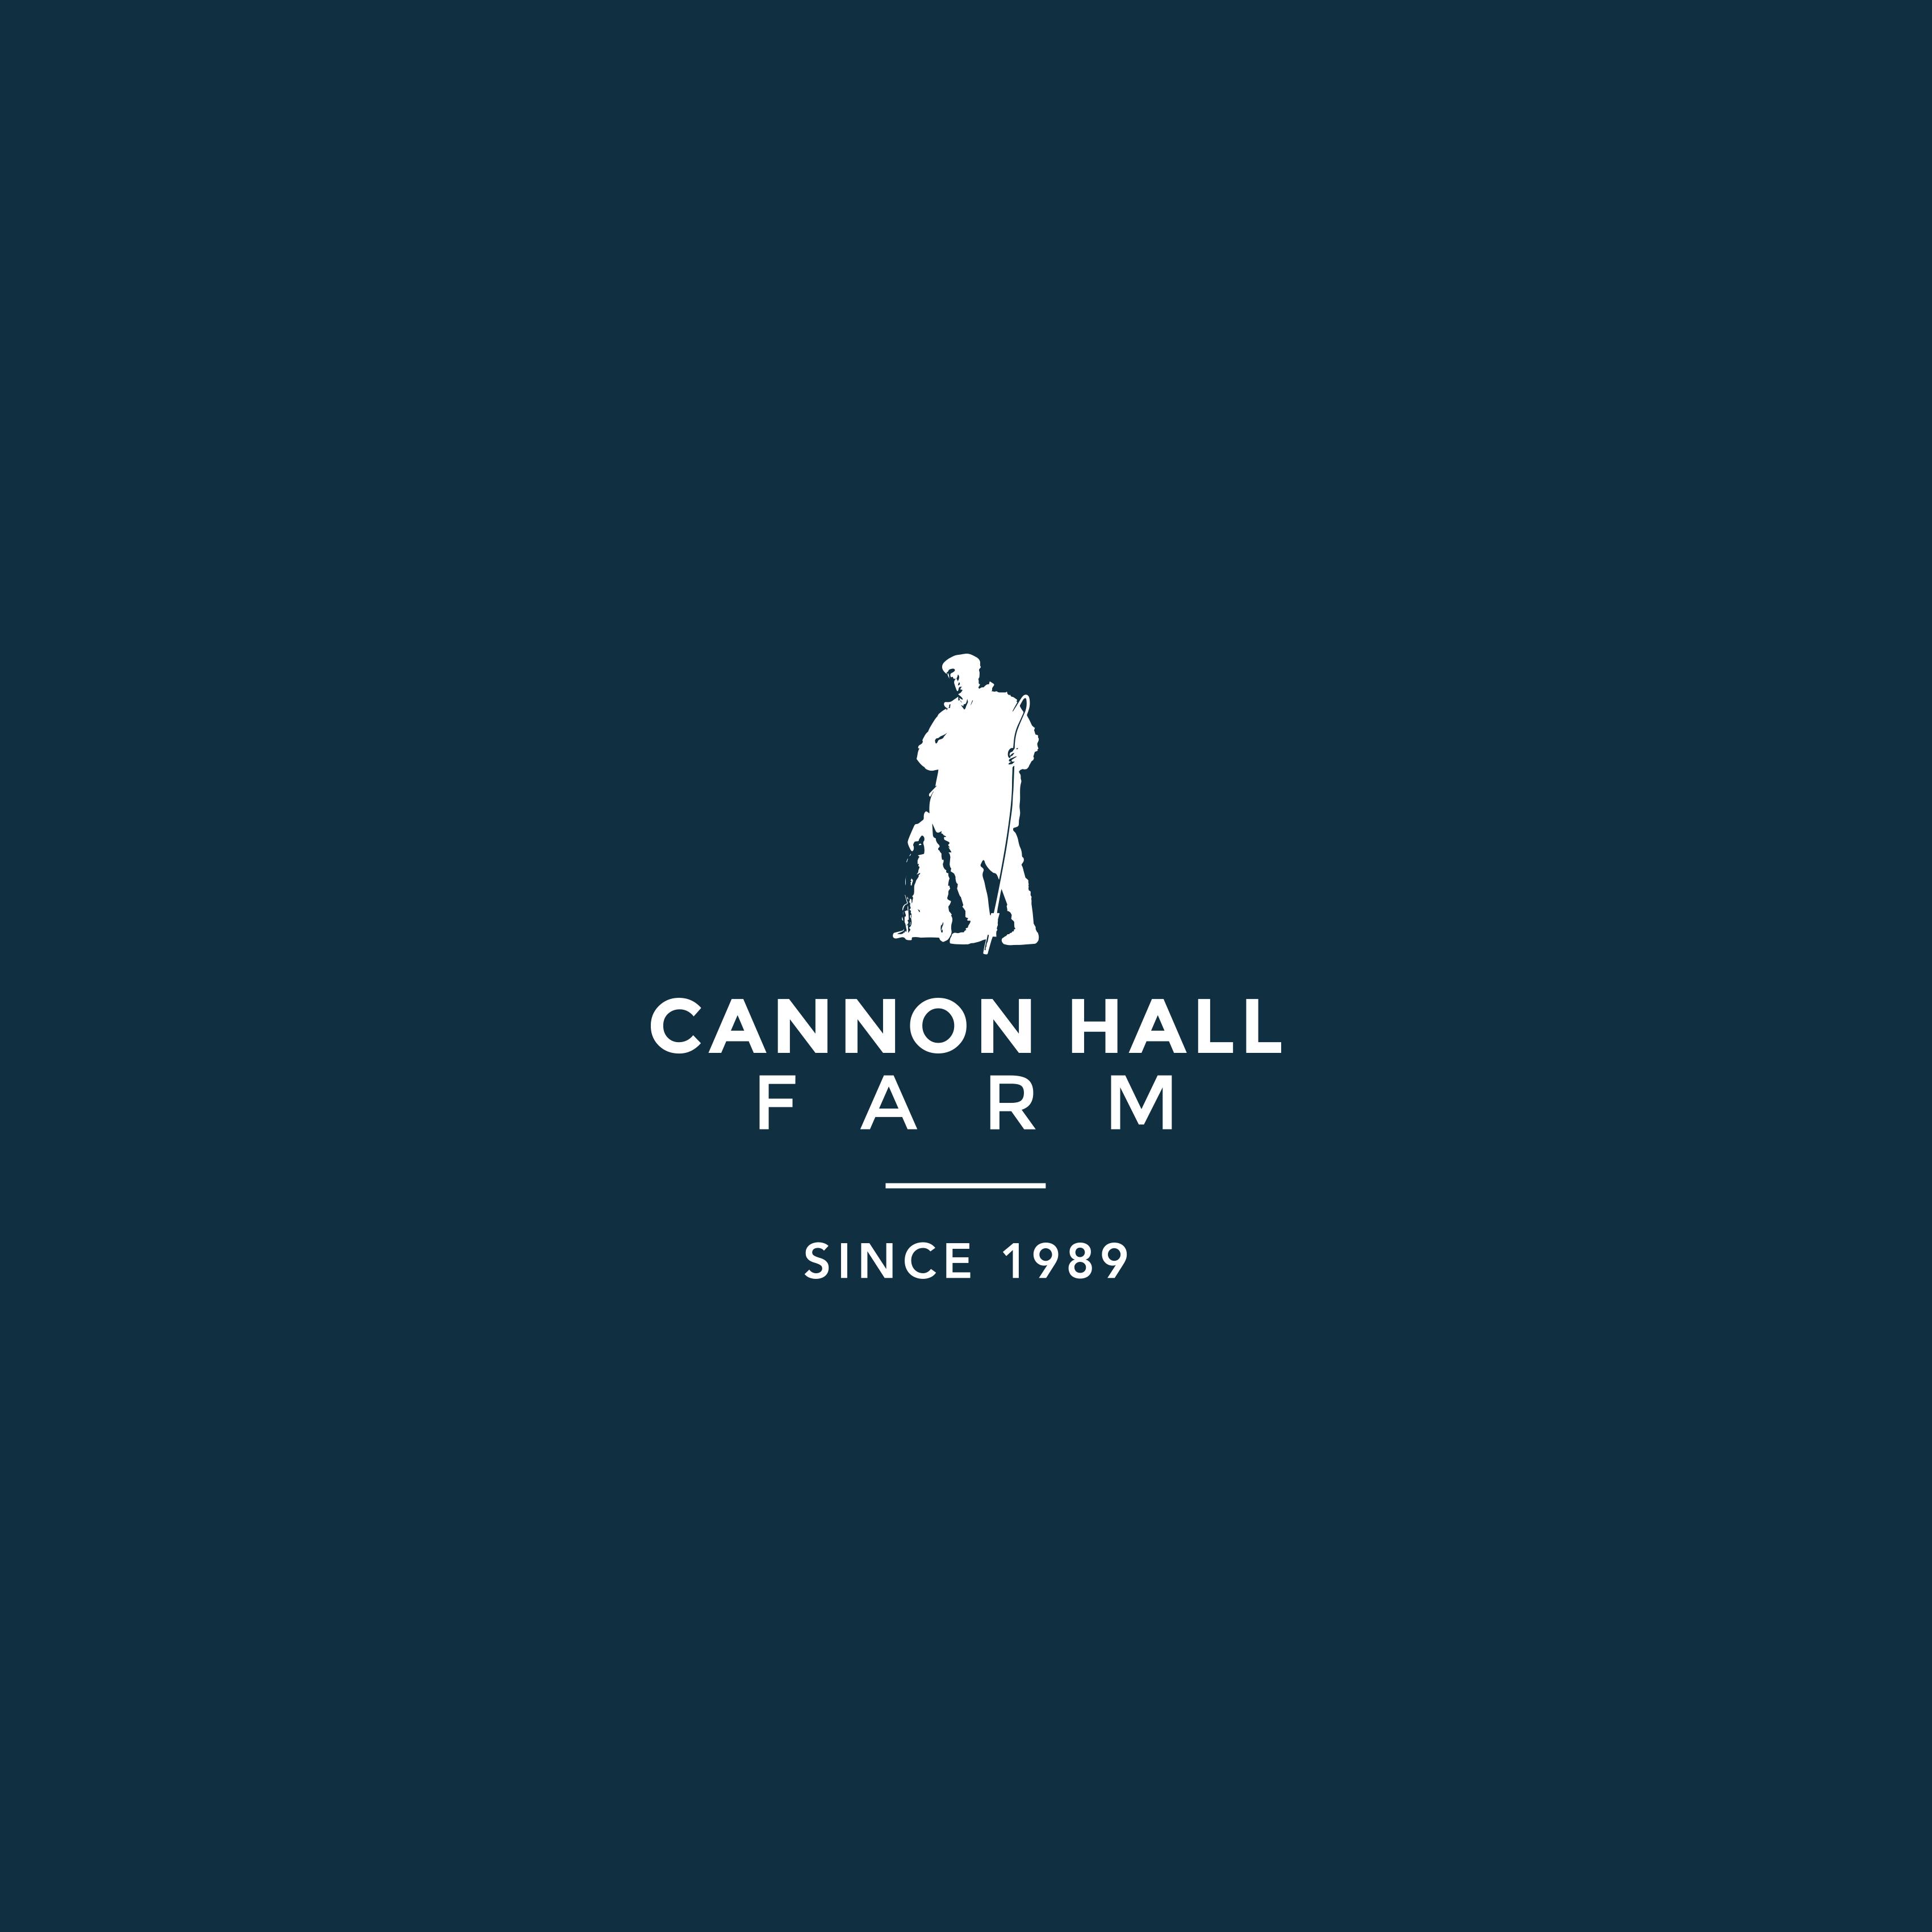 www.cannonhallfarm.co.uk